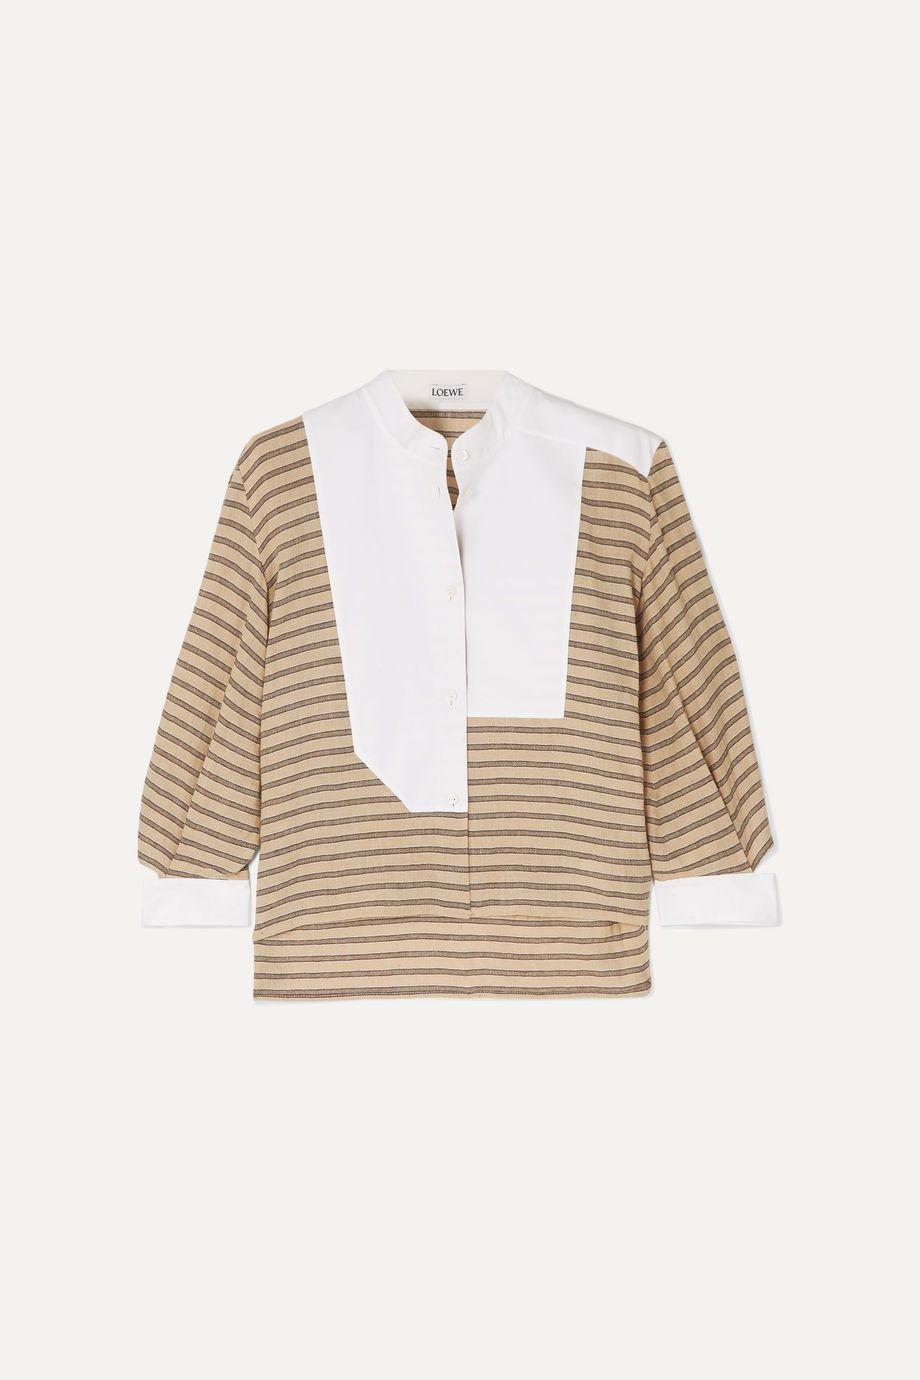 Loewe Cutout poplin-paneled striped cotton-blend shirt